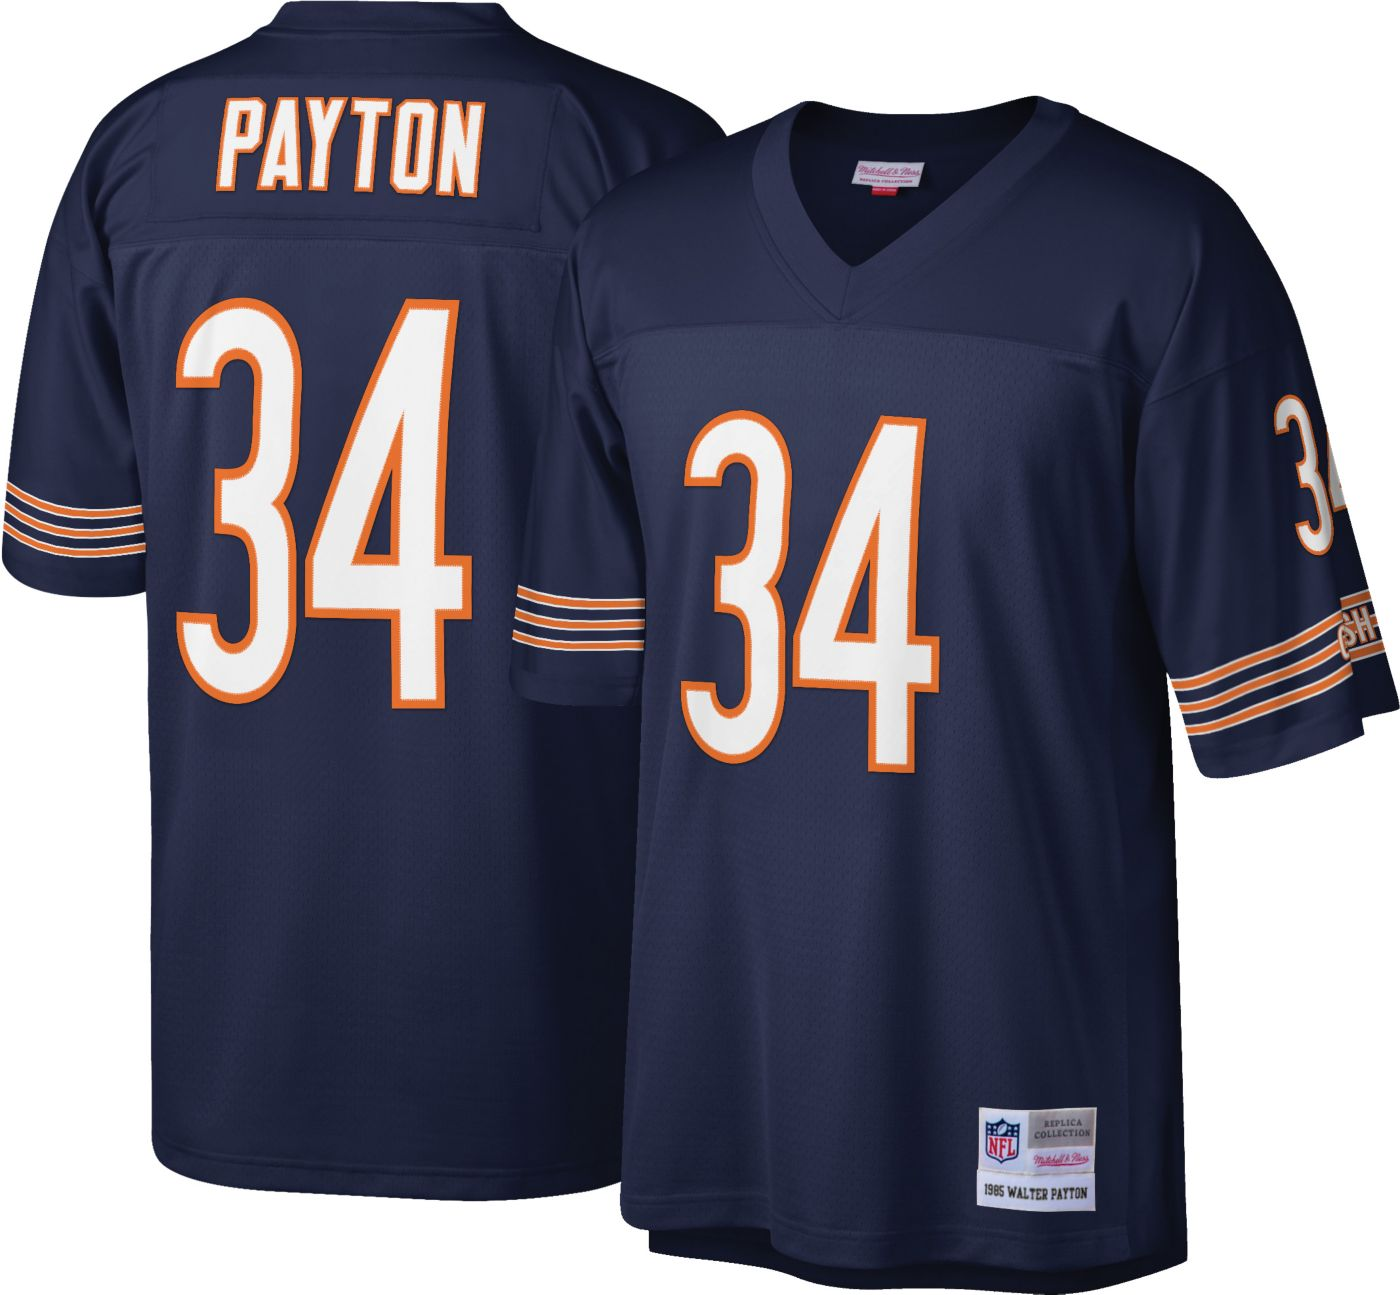 Mitchell & Ness Men's 1985 Game Jersey Chicago Bears Walter Payton #34